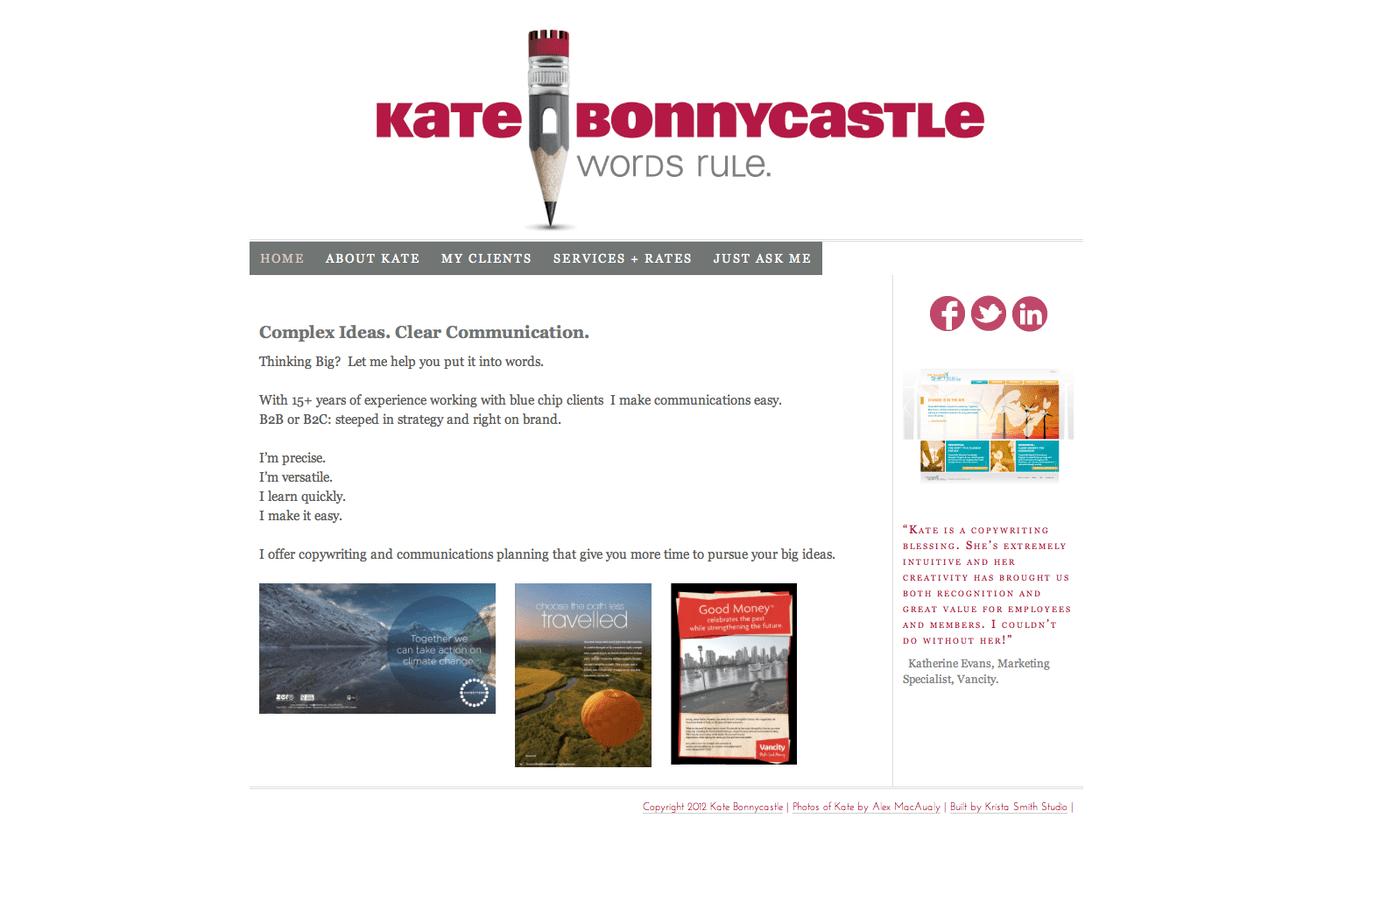 A kristasmith.ca design for Kate Bonnycastle